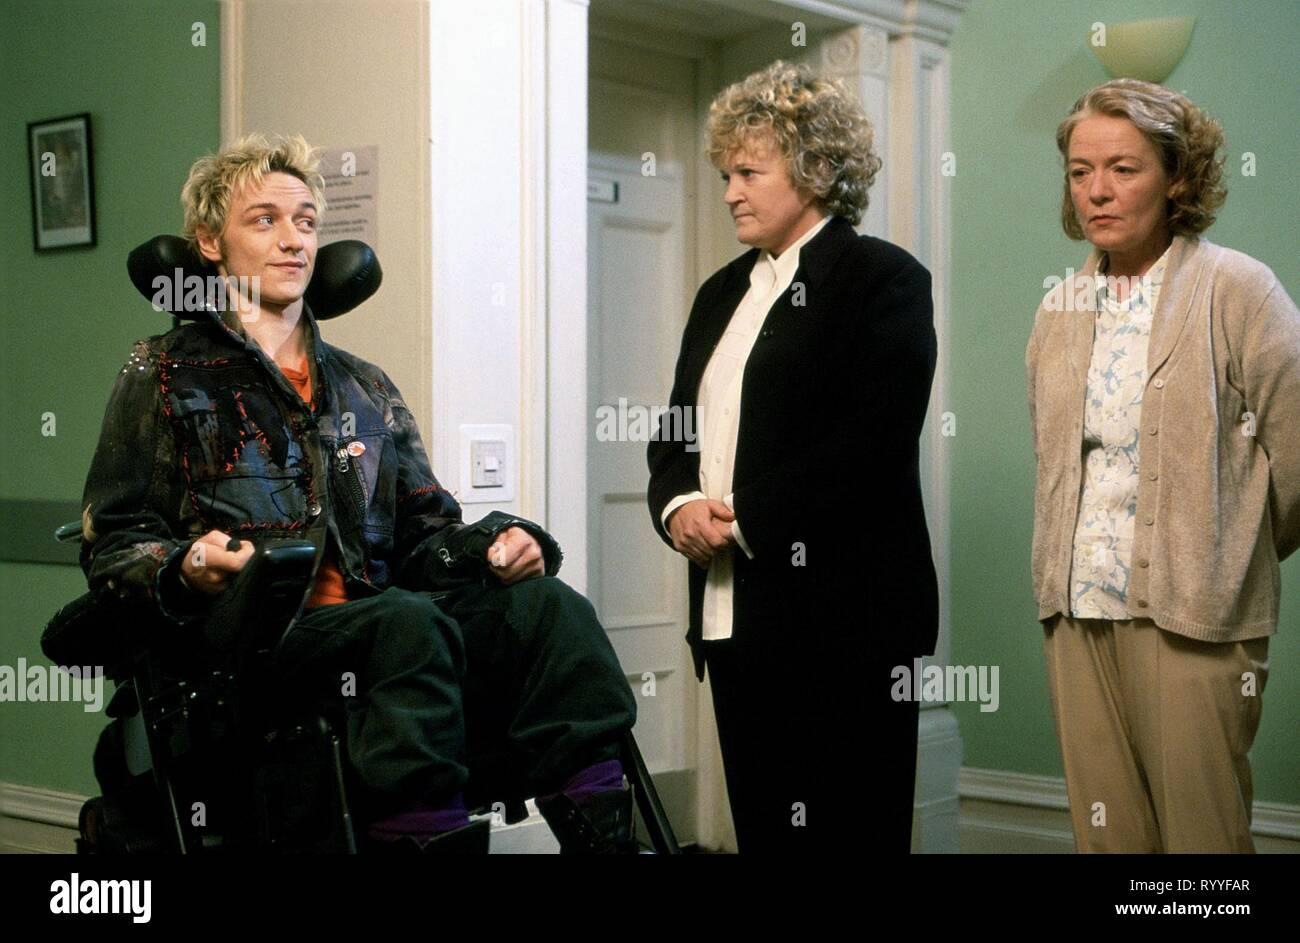 MCAVOY,FRICKER,MCCABE, INSIDE I'M DANCING, 2004 - Stock Image